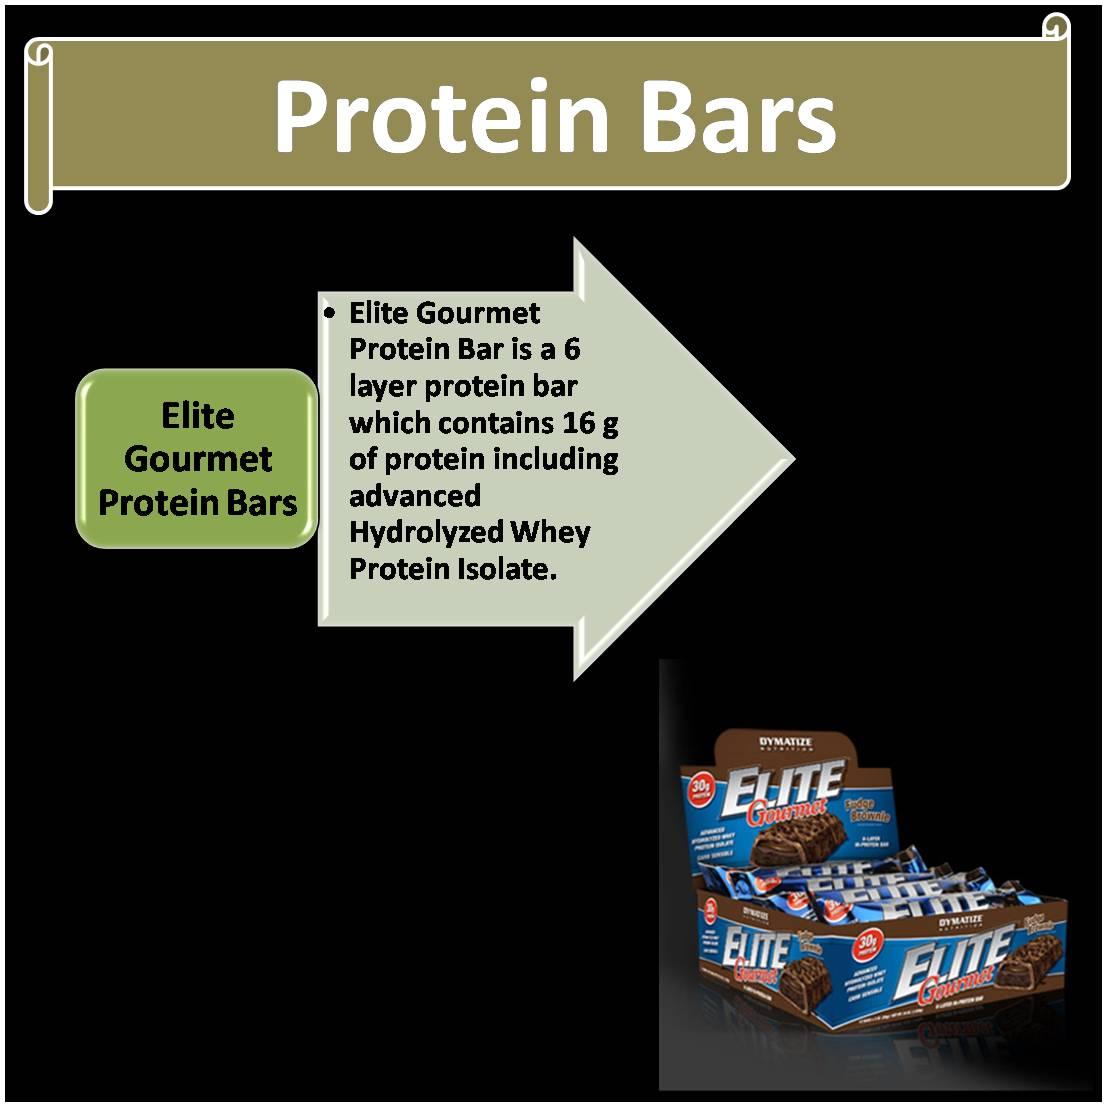 Elite Gourmet Protein Bars